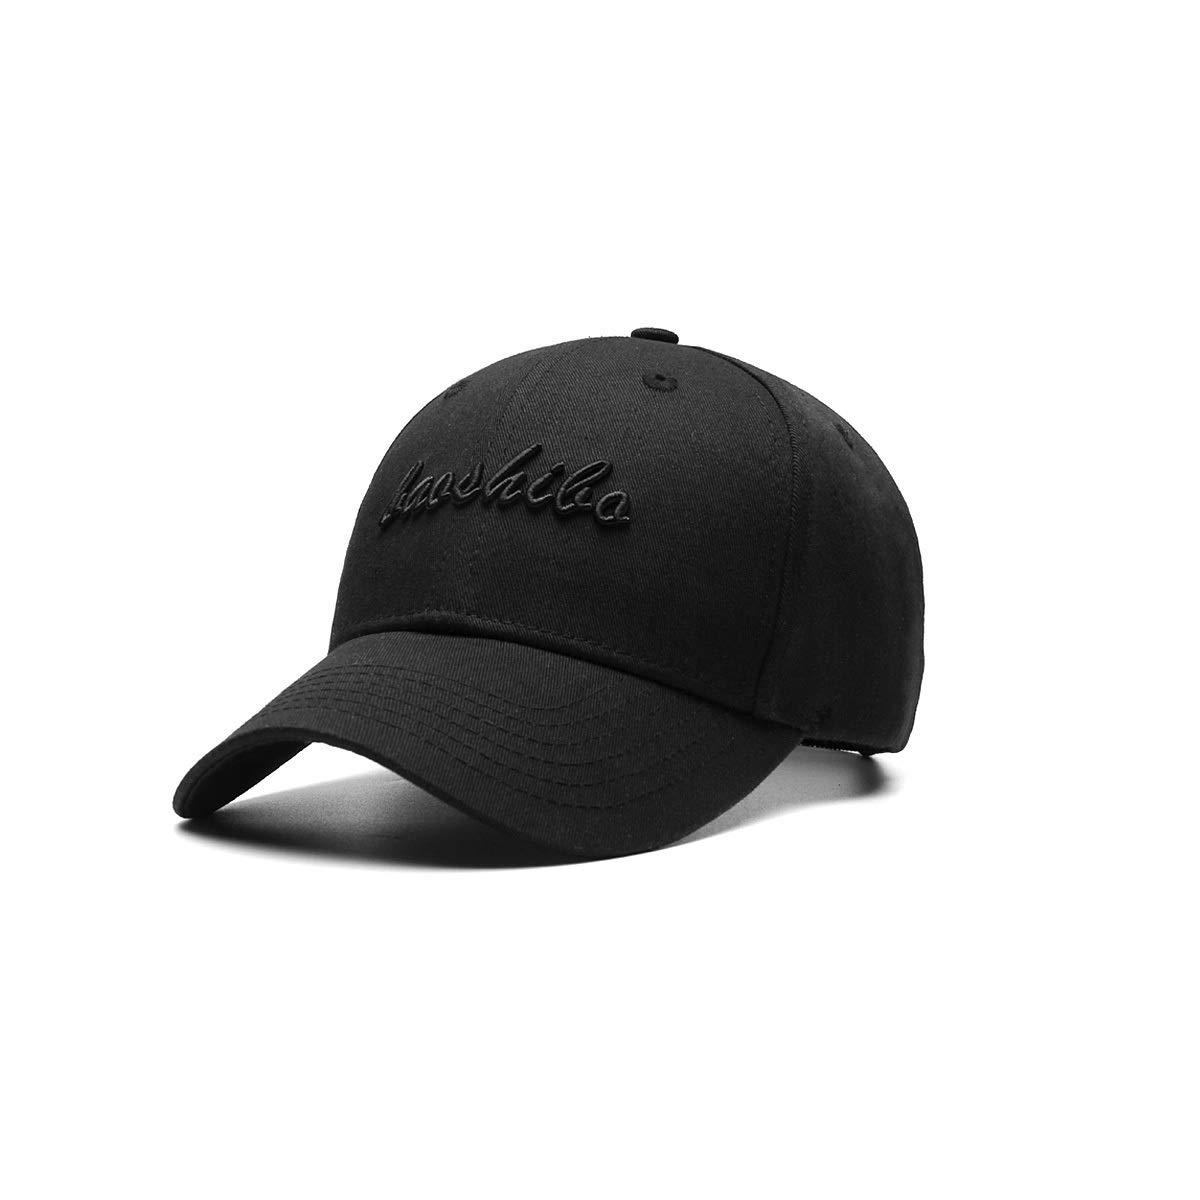 Zhongyue Hat Male Summer Korean Big Head Baseball Cap Black Cap Male Hard Top Large Size Sunhat, Black, White, Red Summer hat (Color : Letter Black)